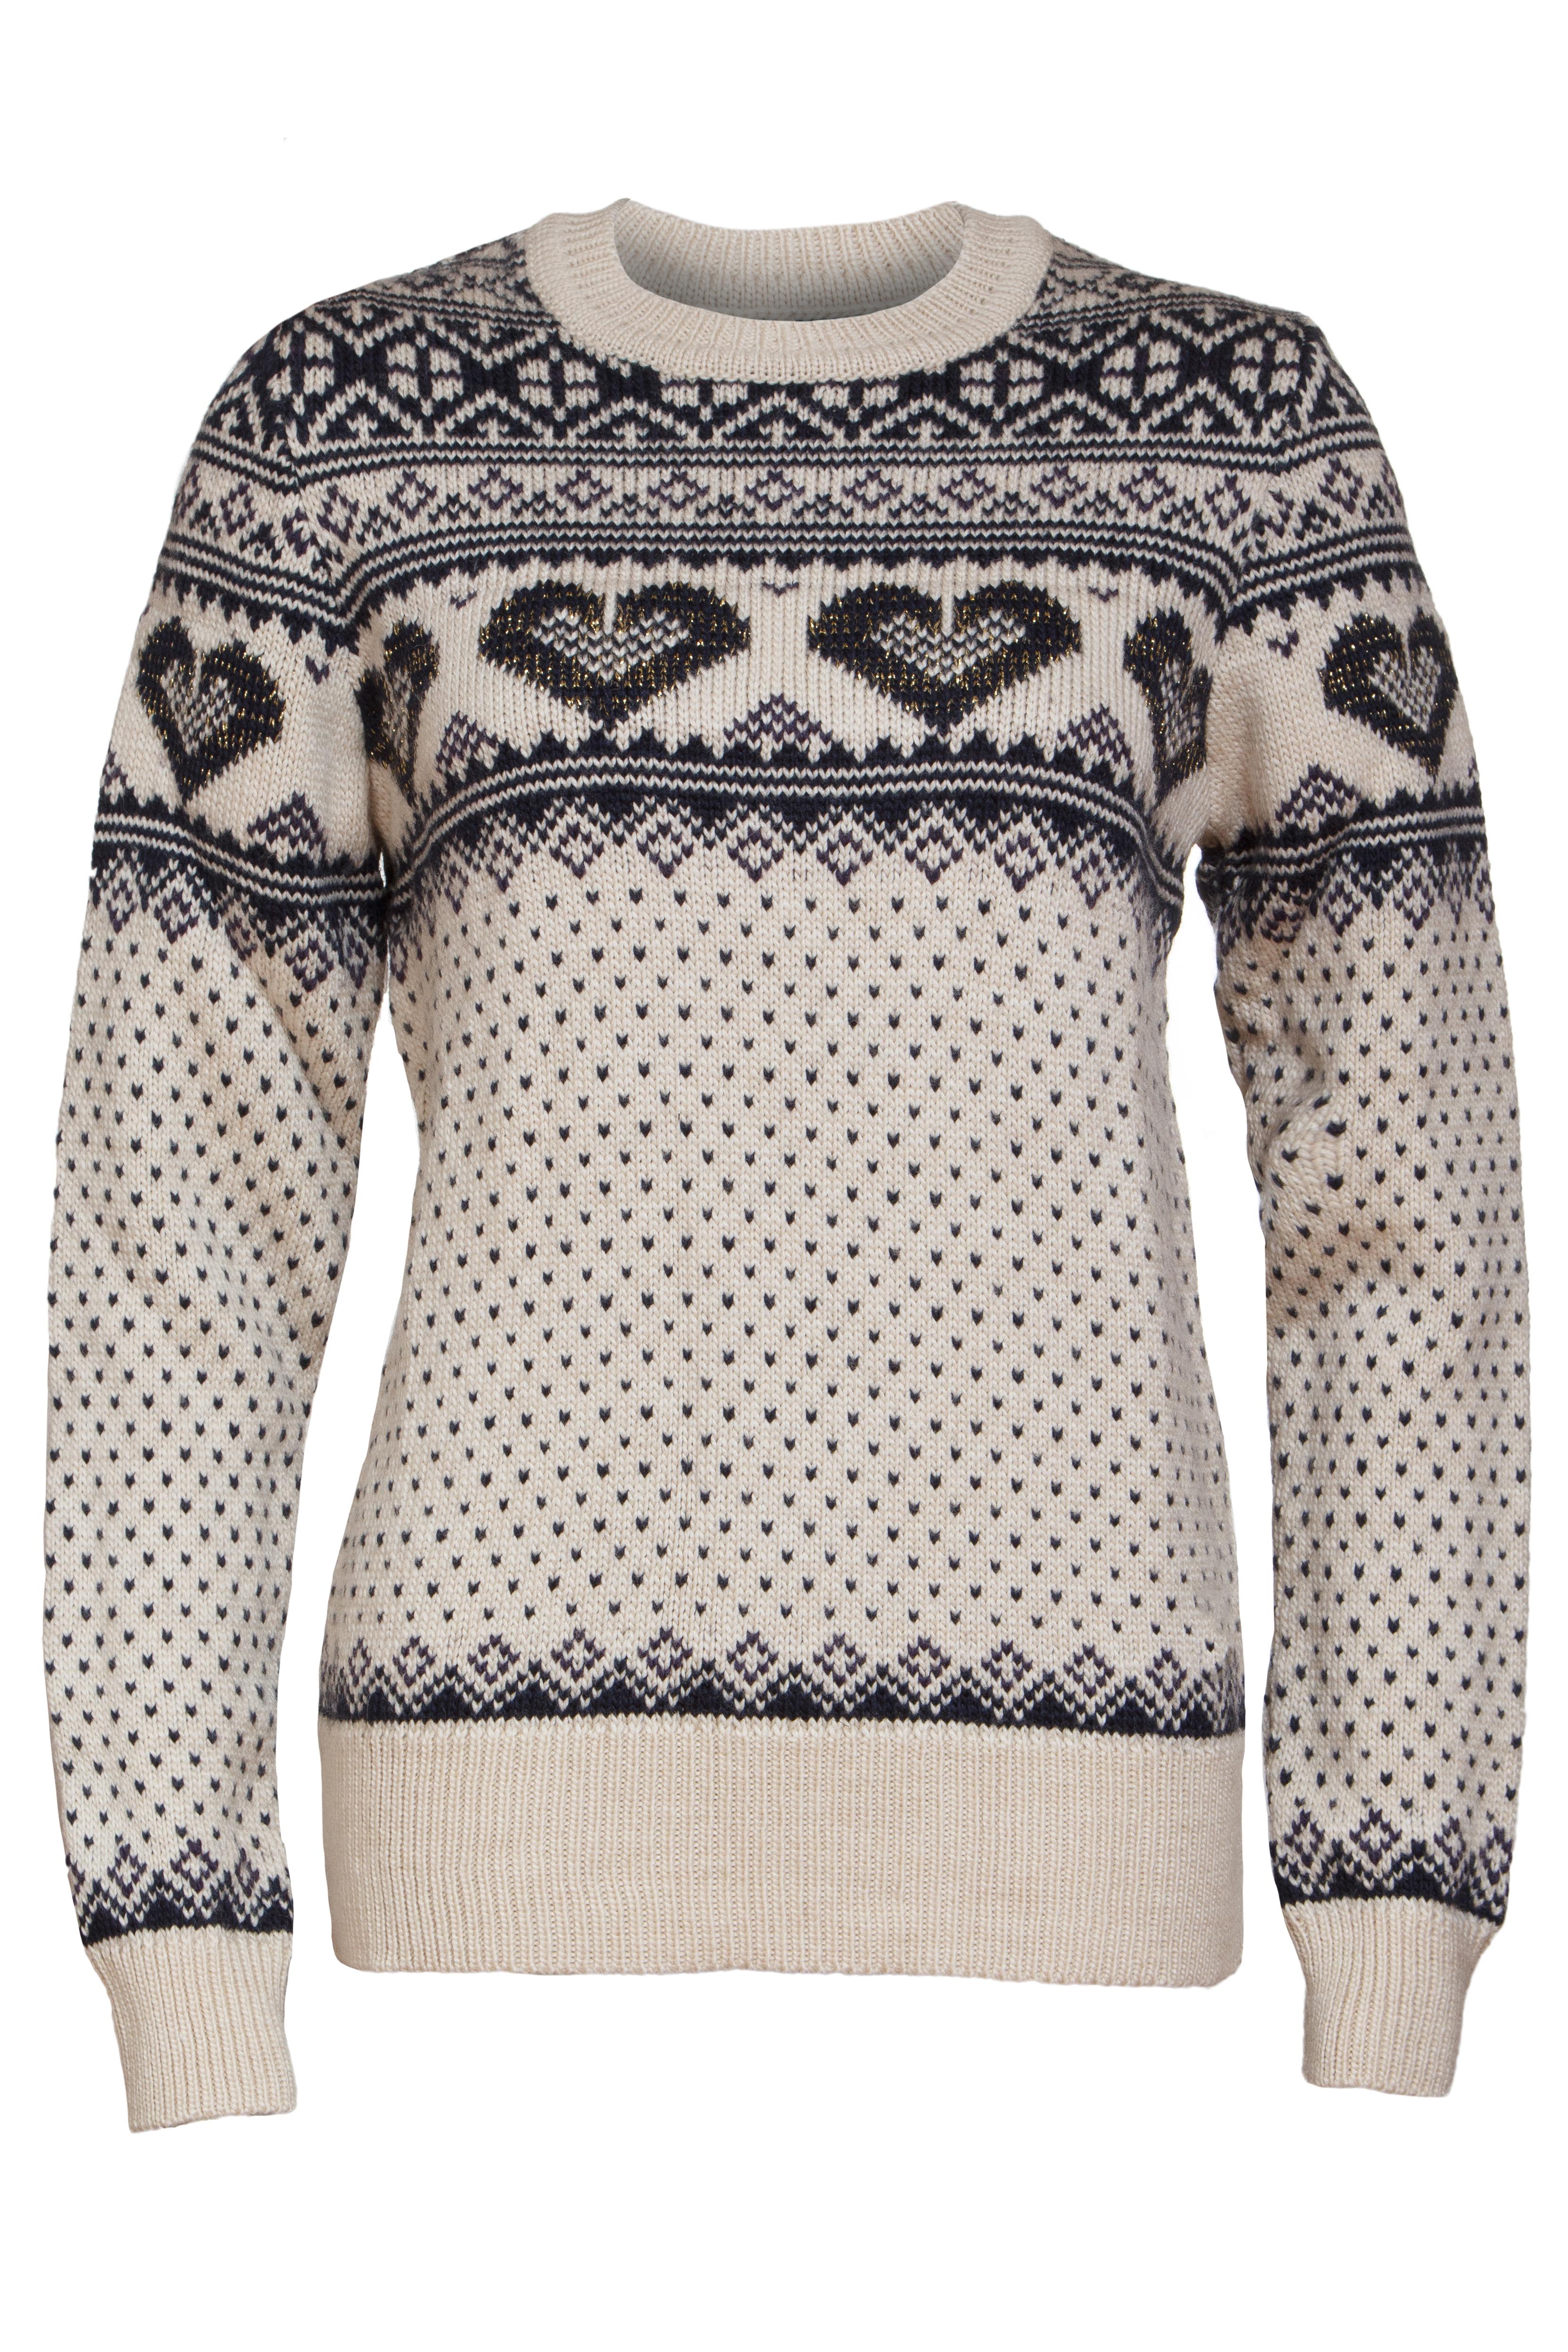 Bespoke knitted sweaters